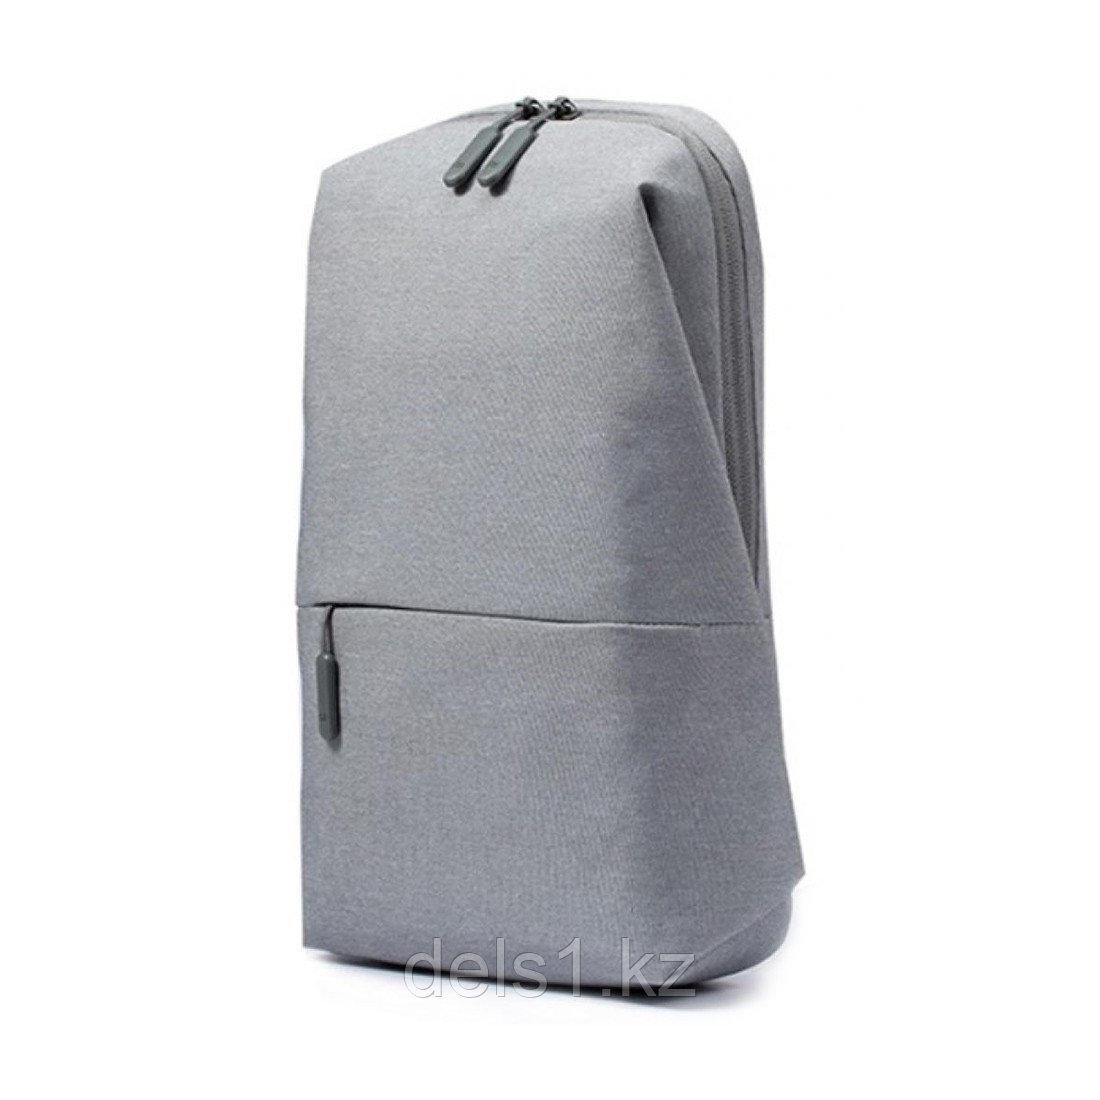 Рюкзак Xiaomi Urban Leisure Chest Серый